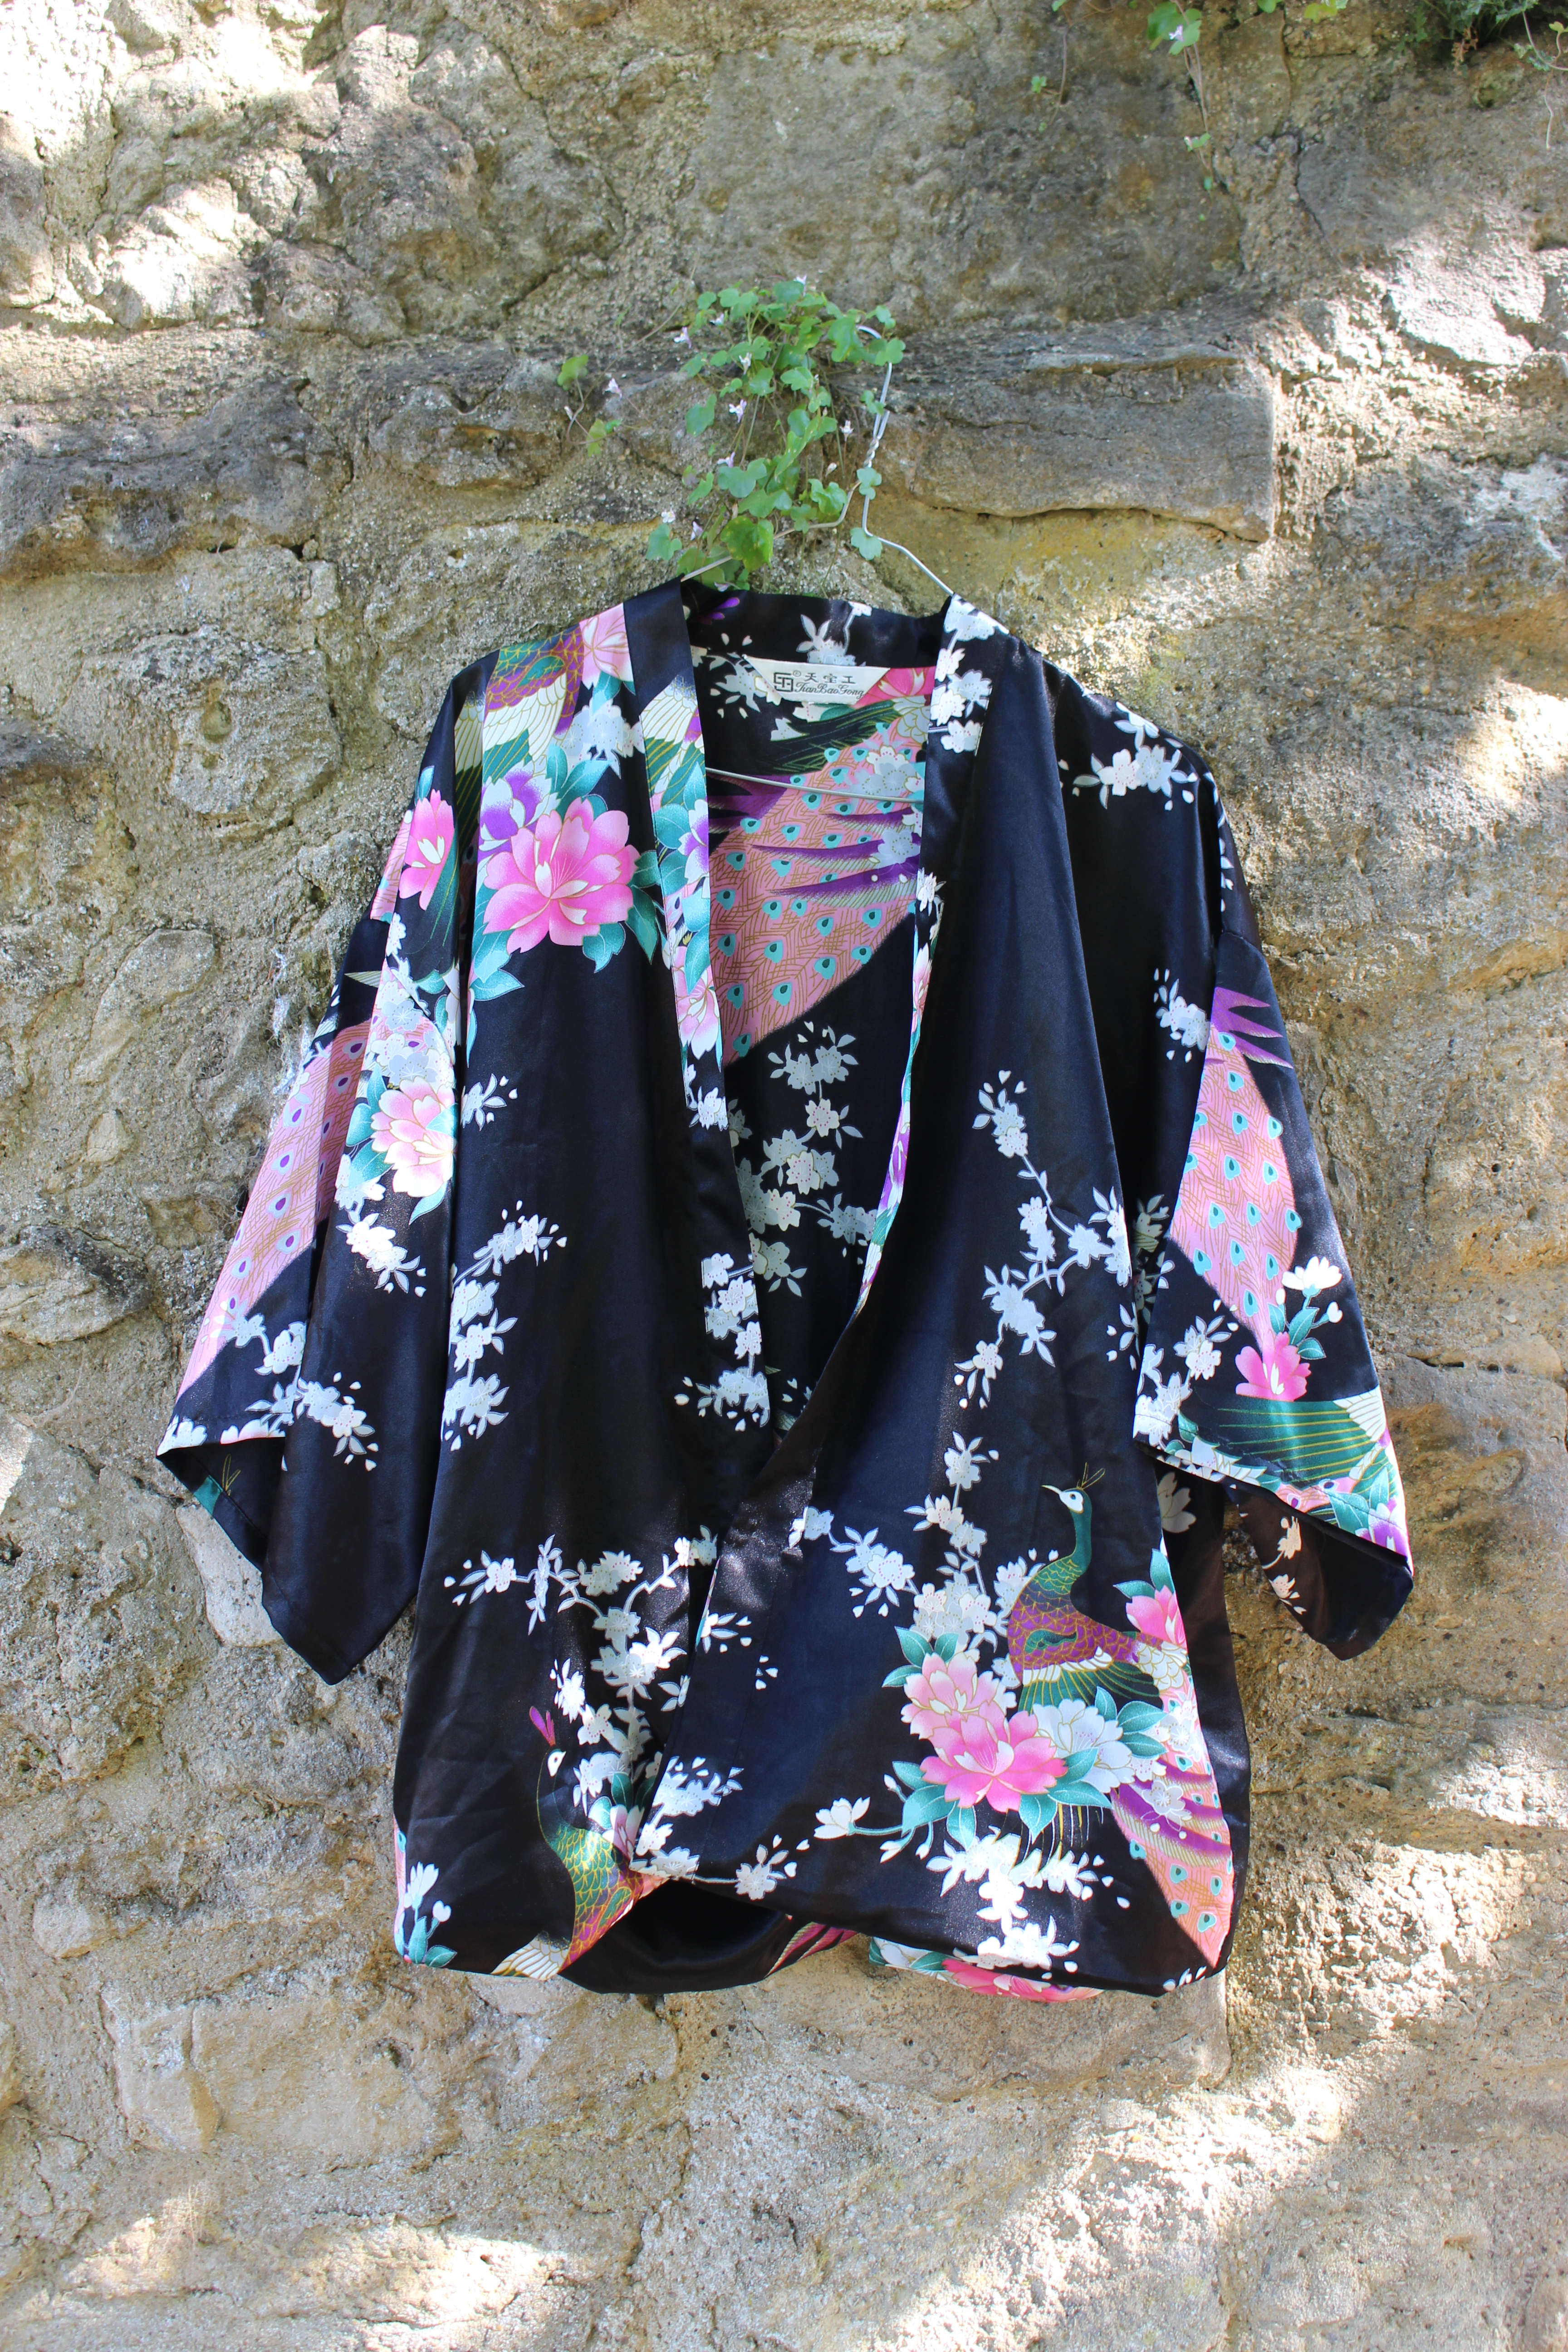 Tian bao gong black peacock kimono, from Unicorn, 5 Ship Street, Oxford